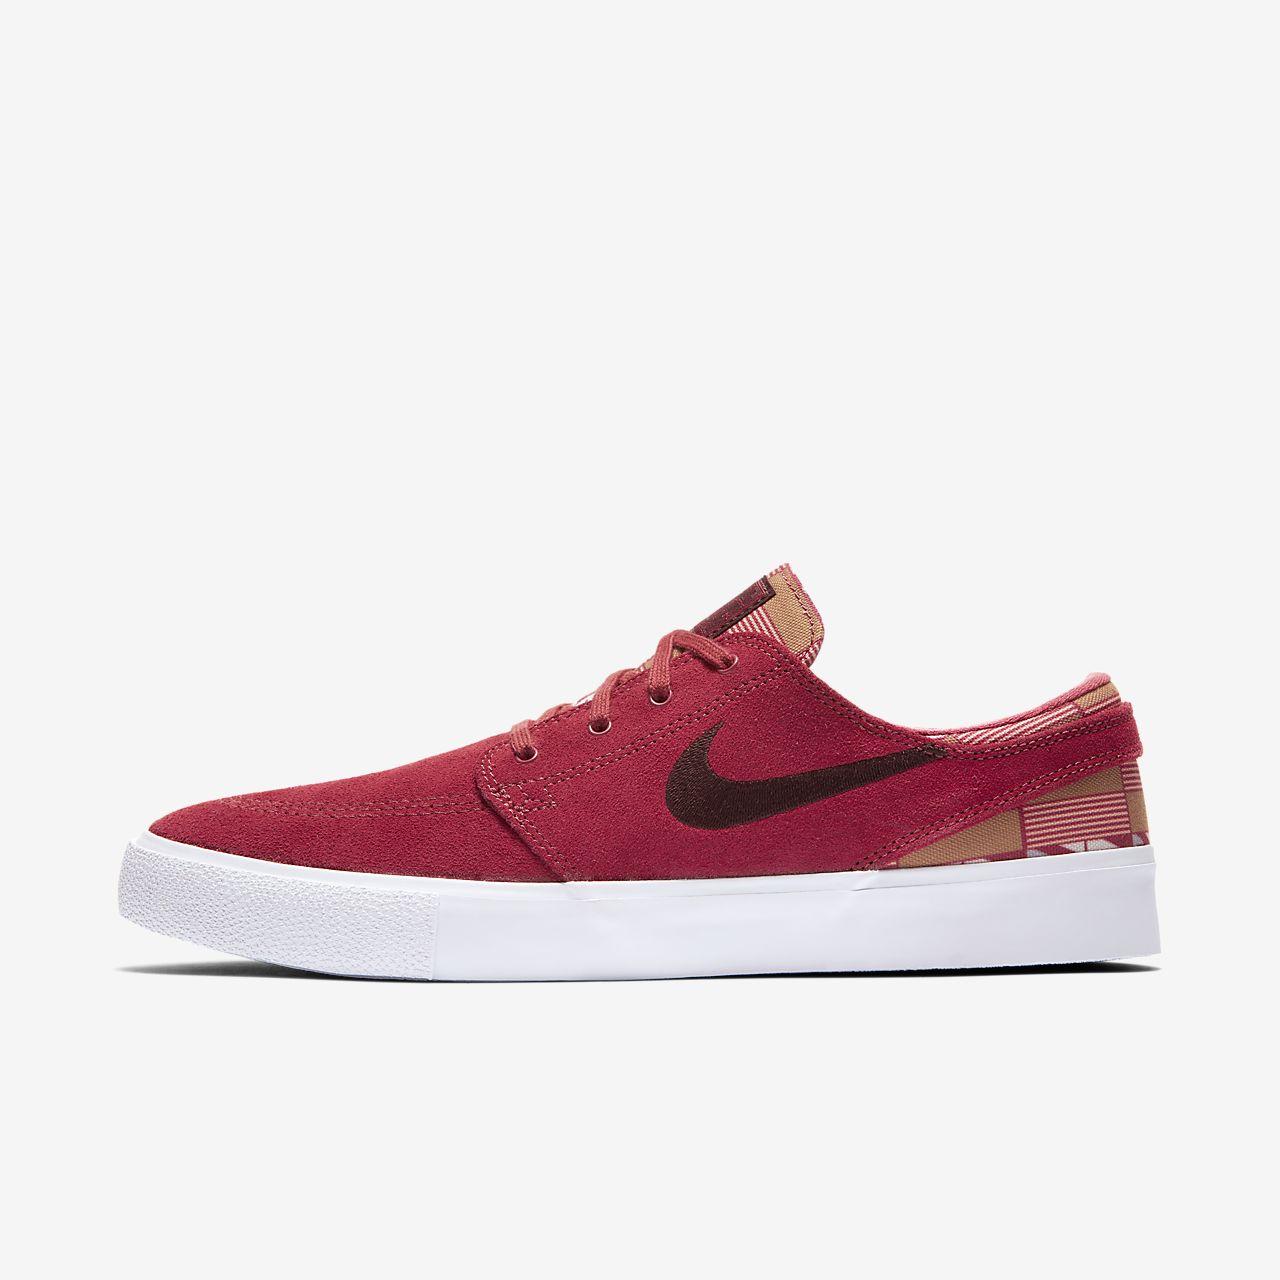 Chaussure de skateboard Nike SB Zoom Stefan Janoski RM Premium